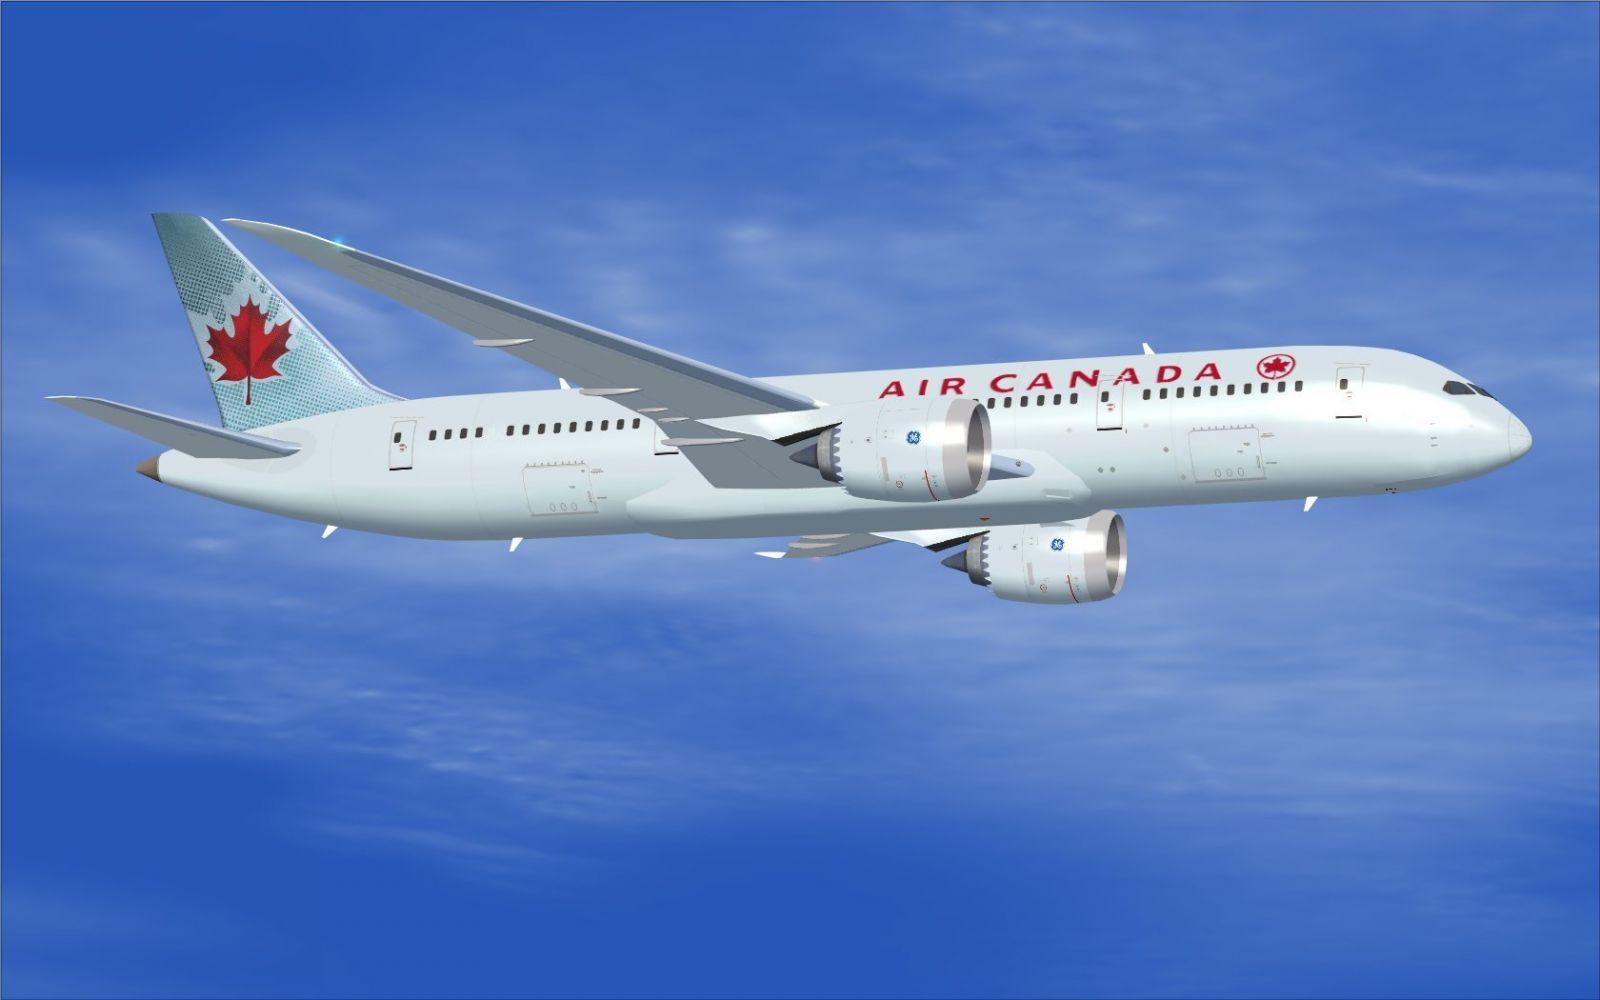 Air Canada Announces Nonstop Toronto To Jax Service